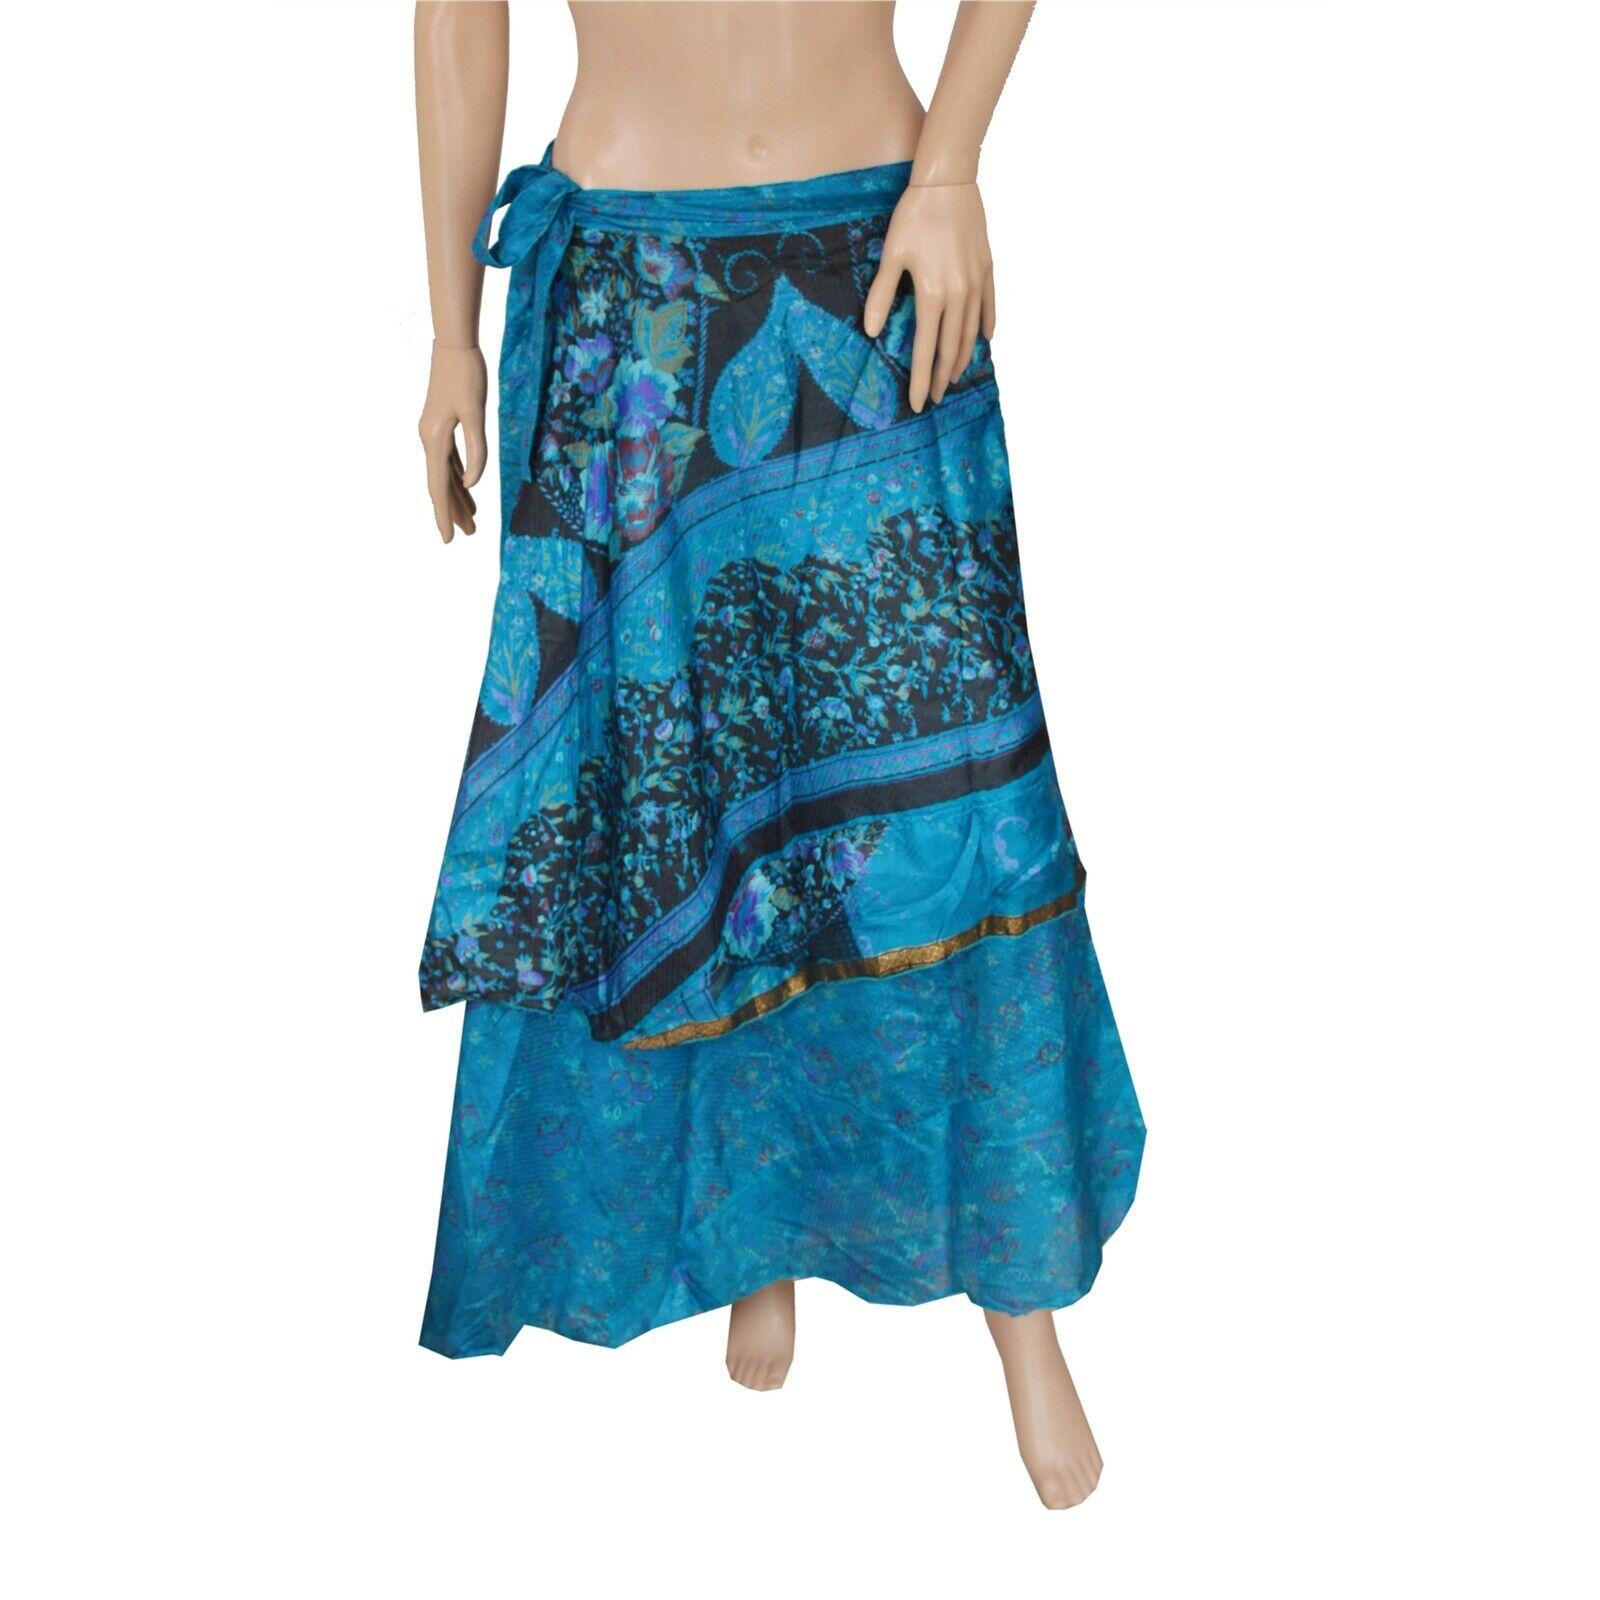 Sanskriti New Pure Silk Fabric Women Wraparound Long Skirt Floral Printed bluee